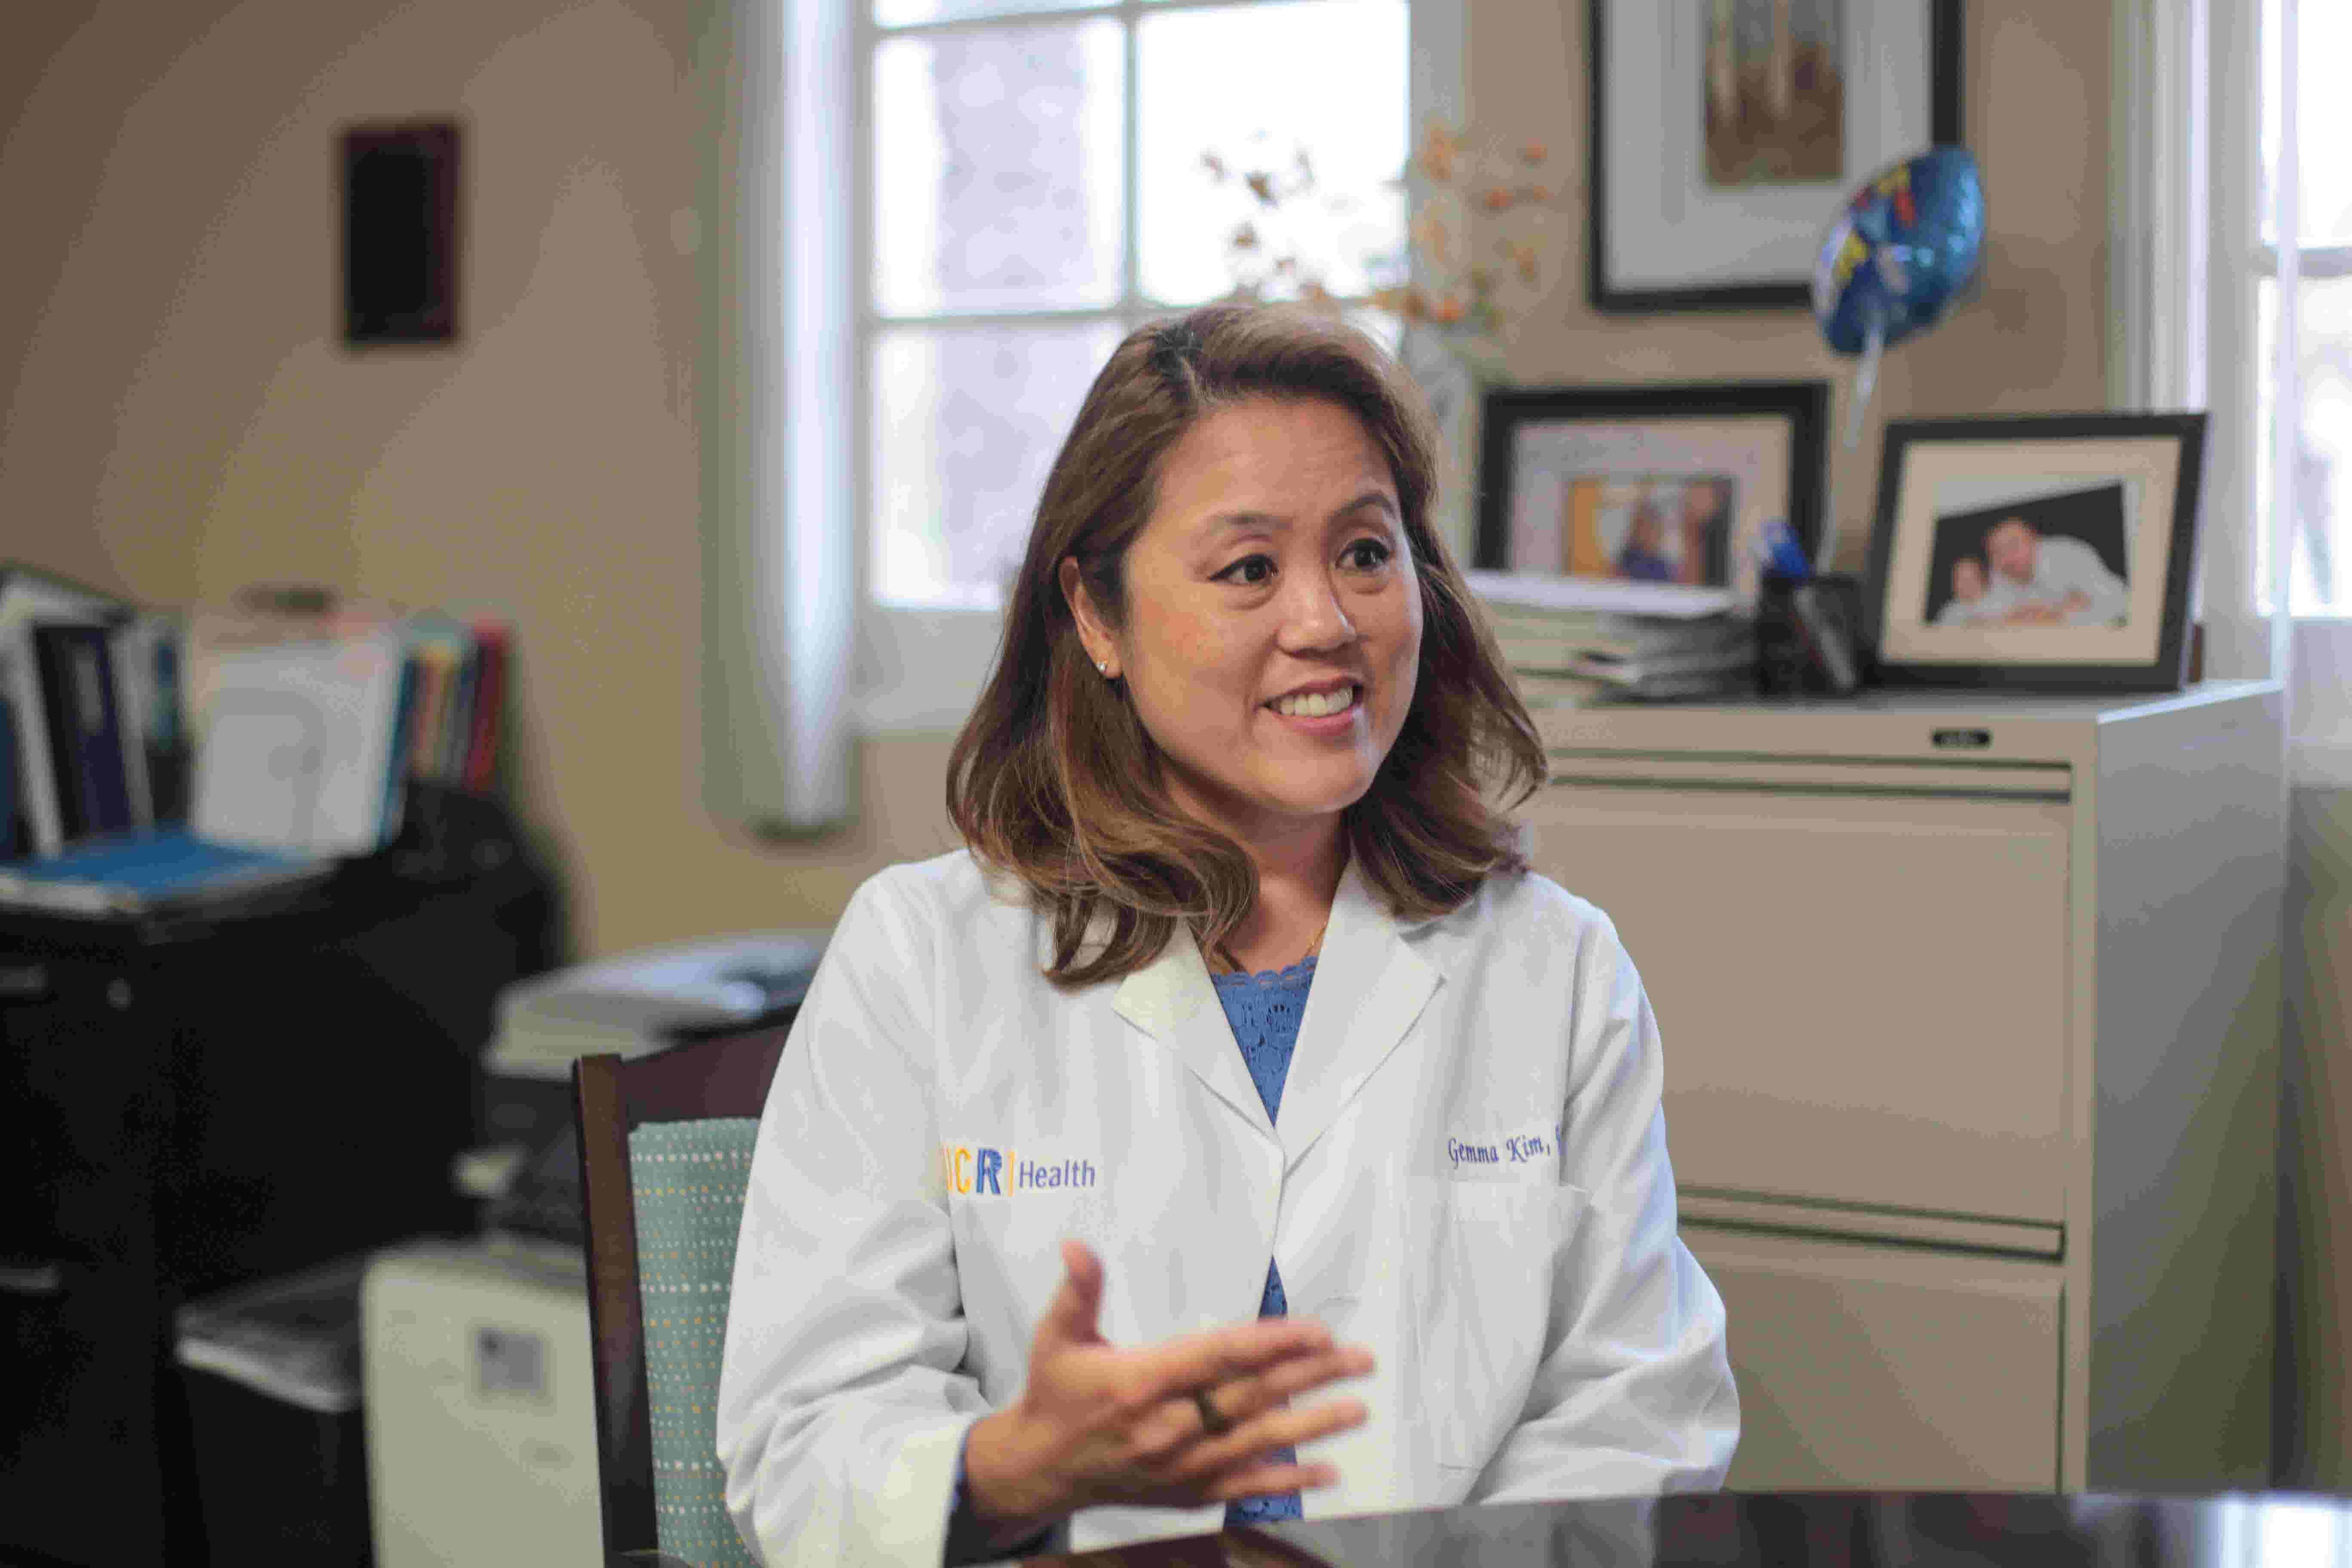 dr gemma kim on the benefits of ucr s medical residency program in